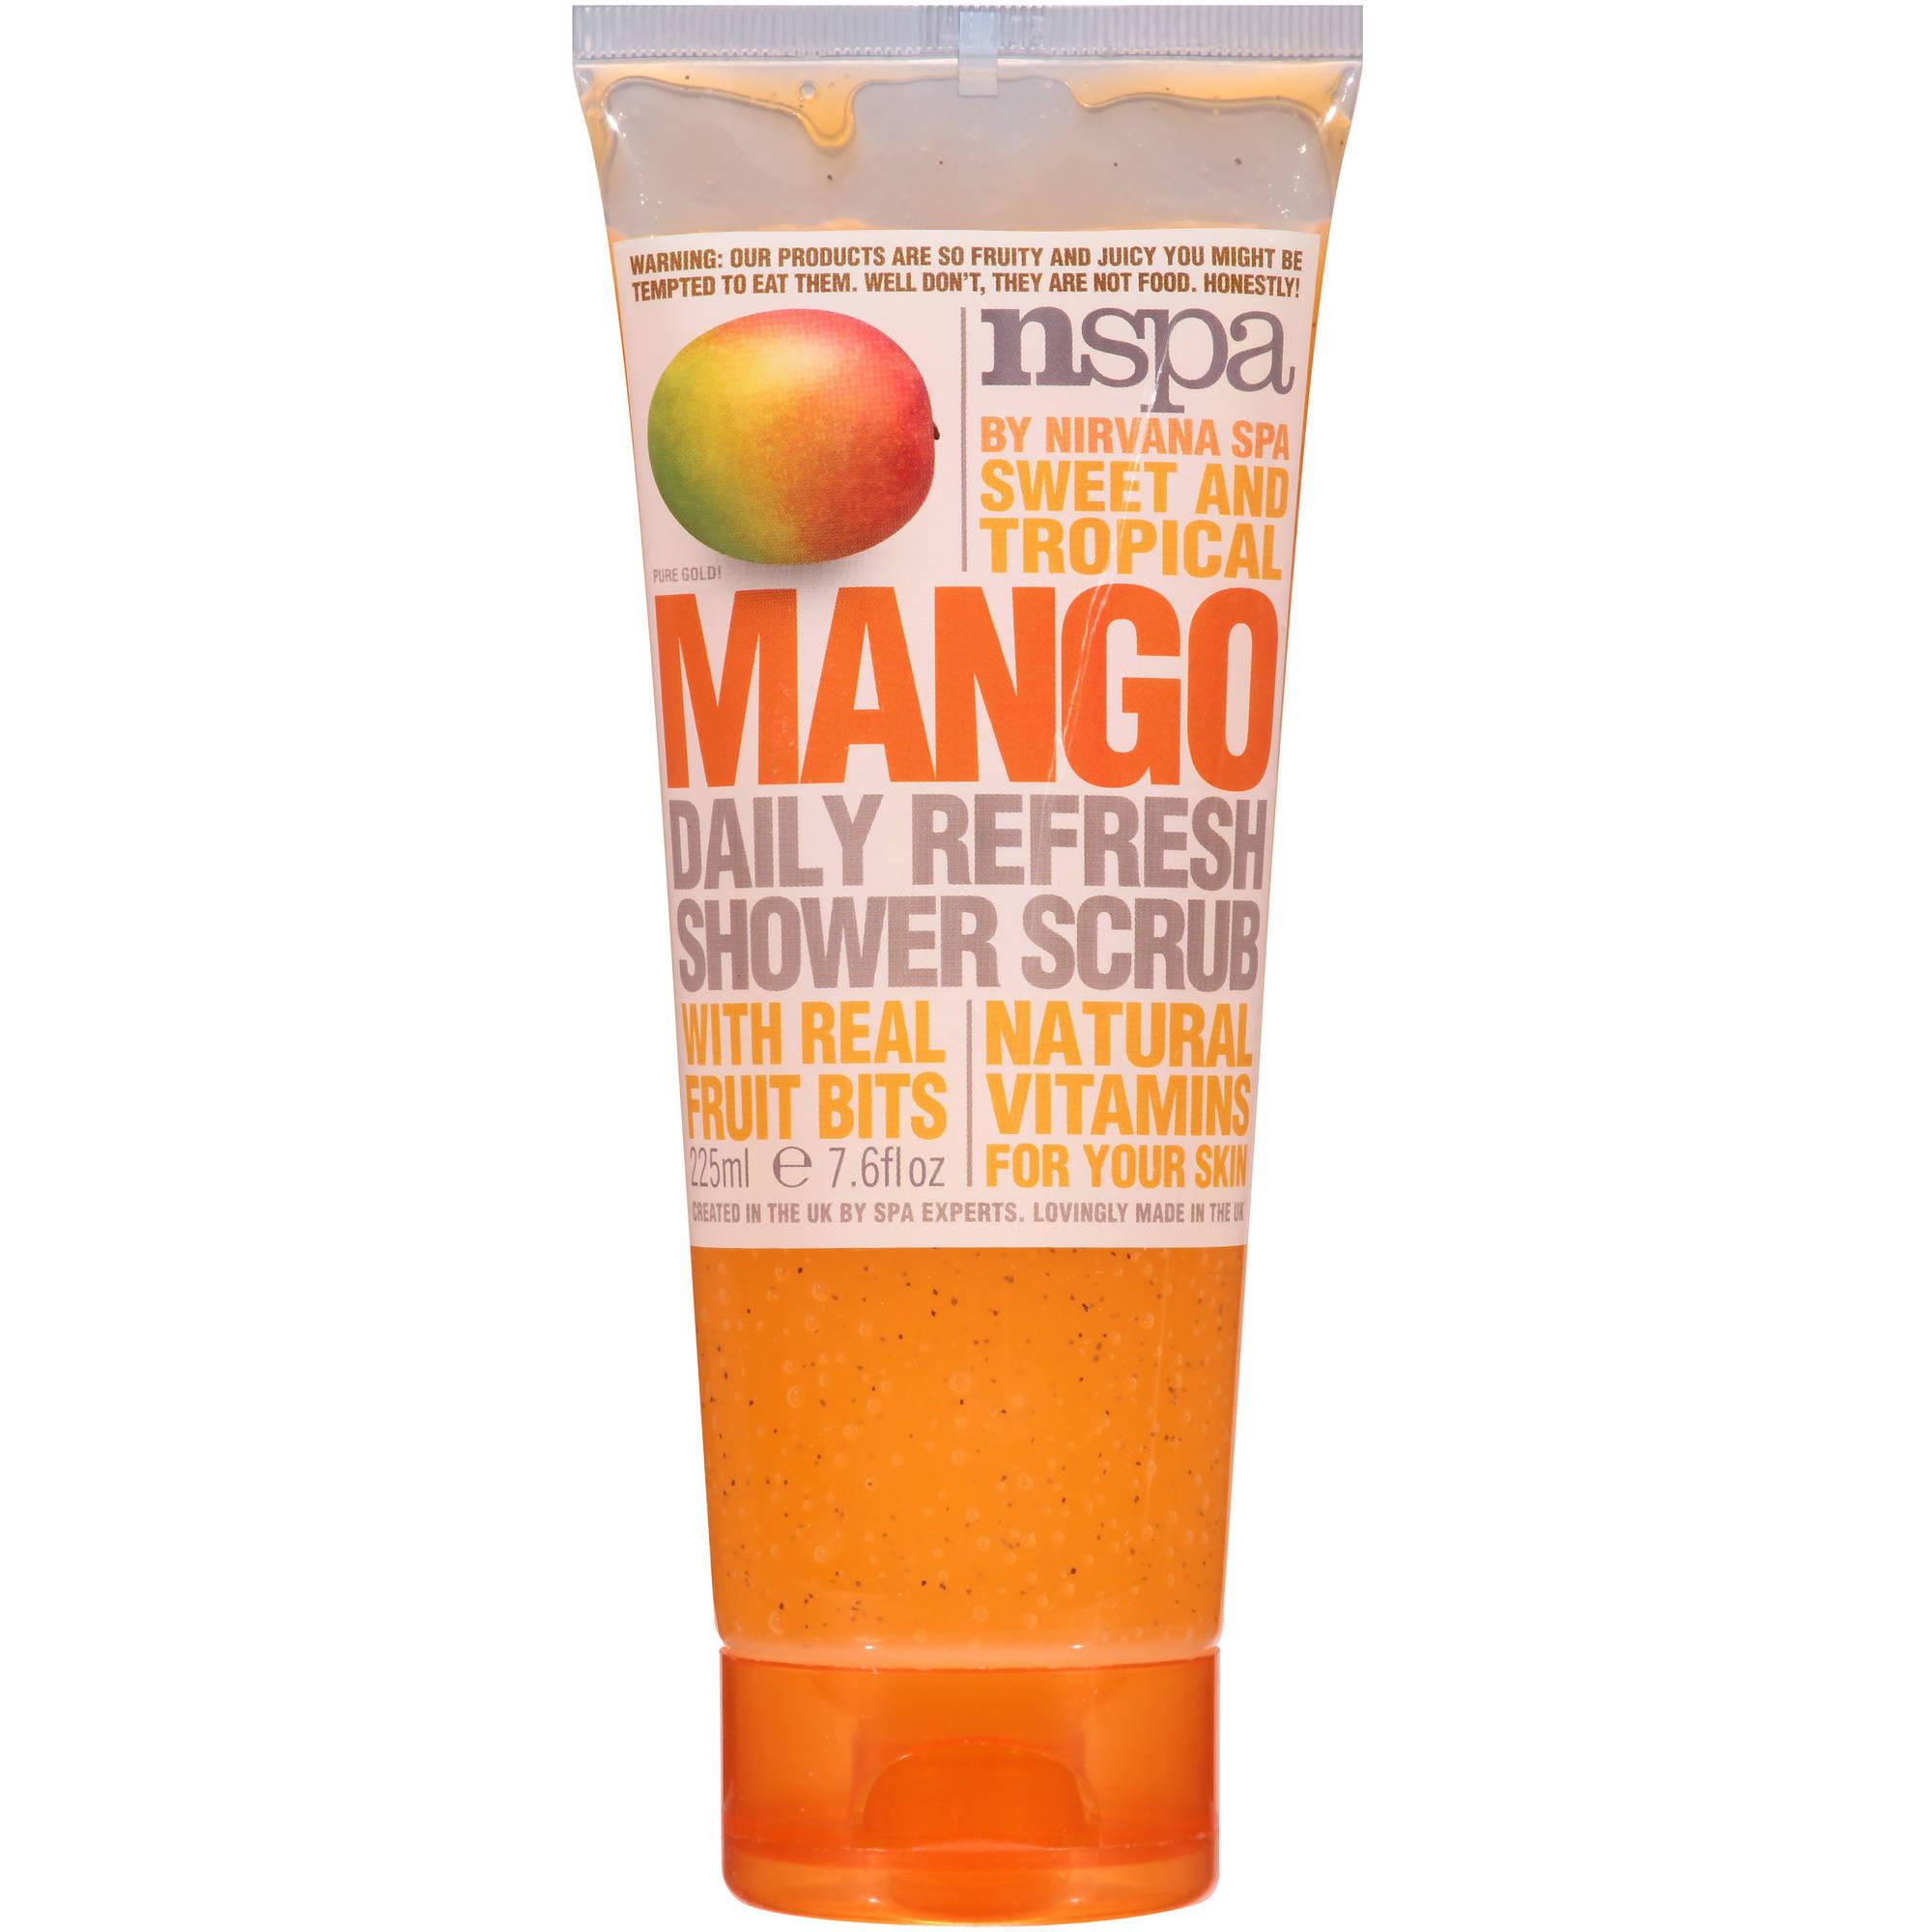 NSPA Sweet and Tropical Mango Daily Refresh Shower Scrub, 7.6 fl oz